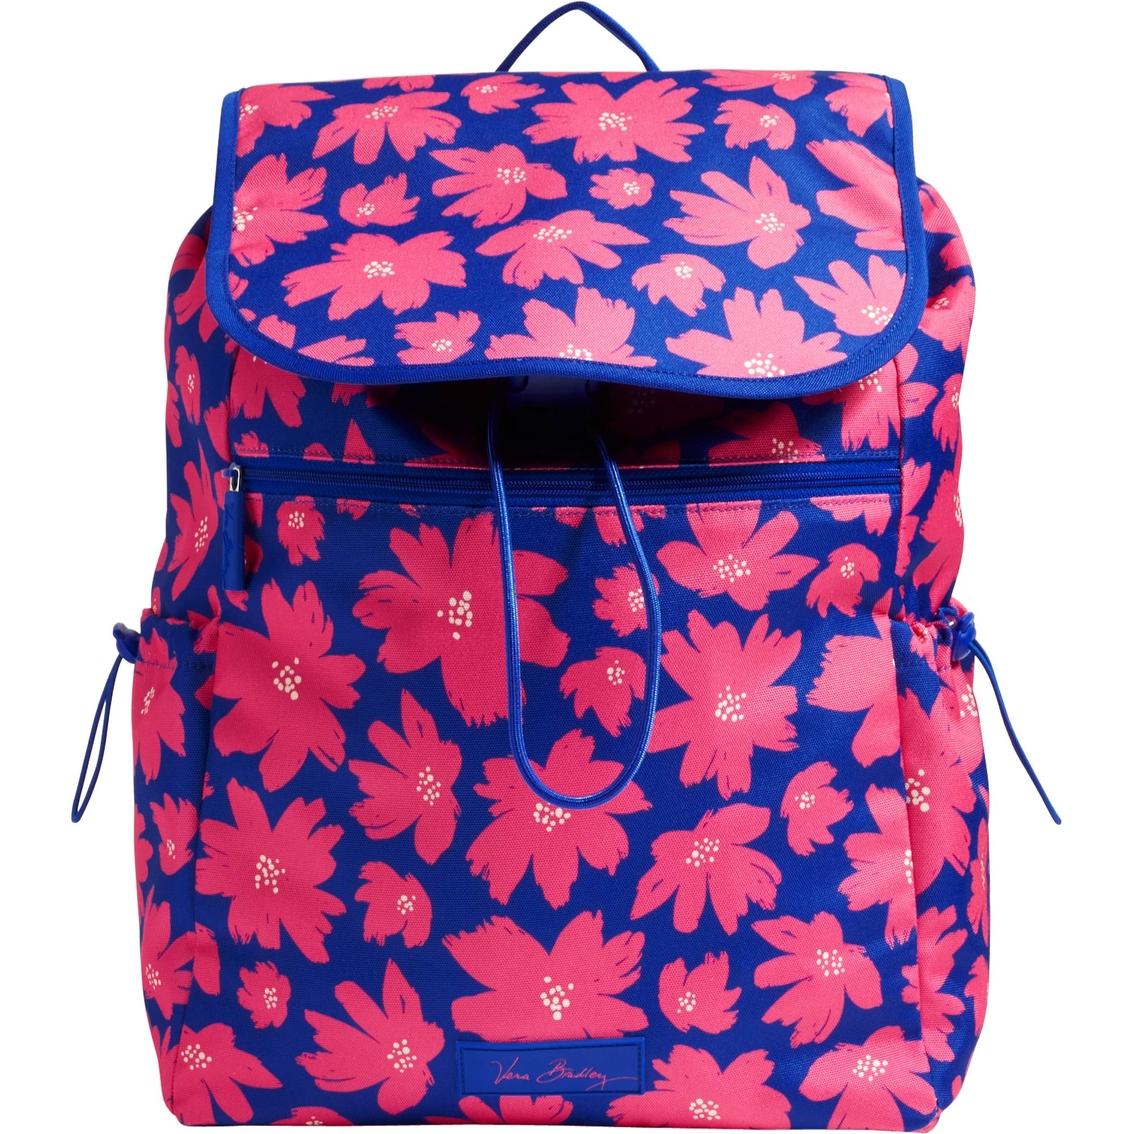 Vera Bradley Lighten Up Drawstring Backpack, Art Poppies